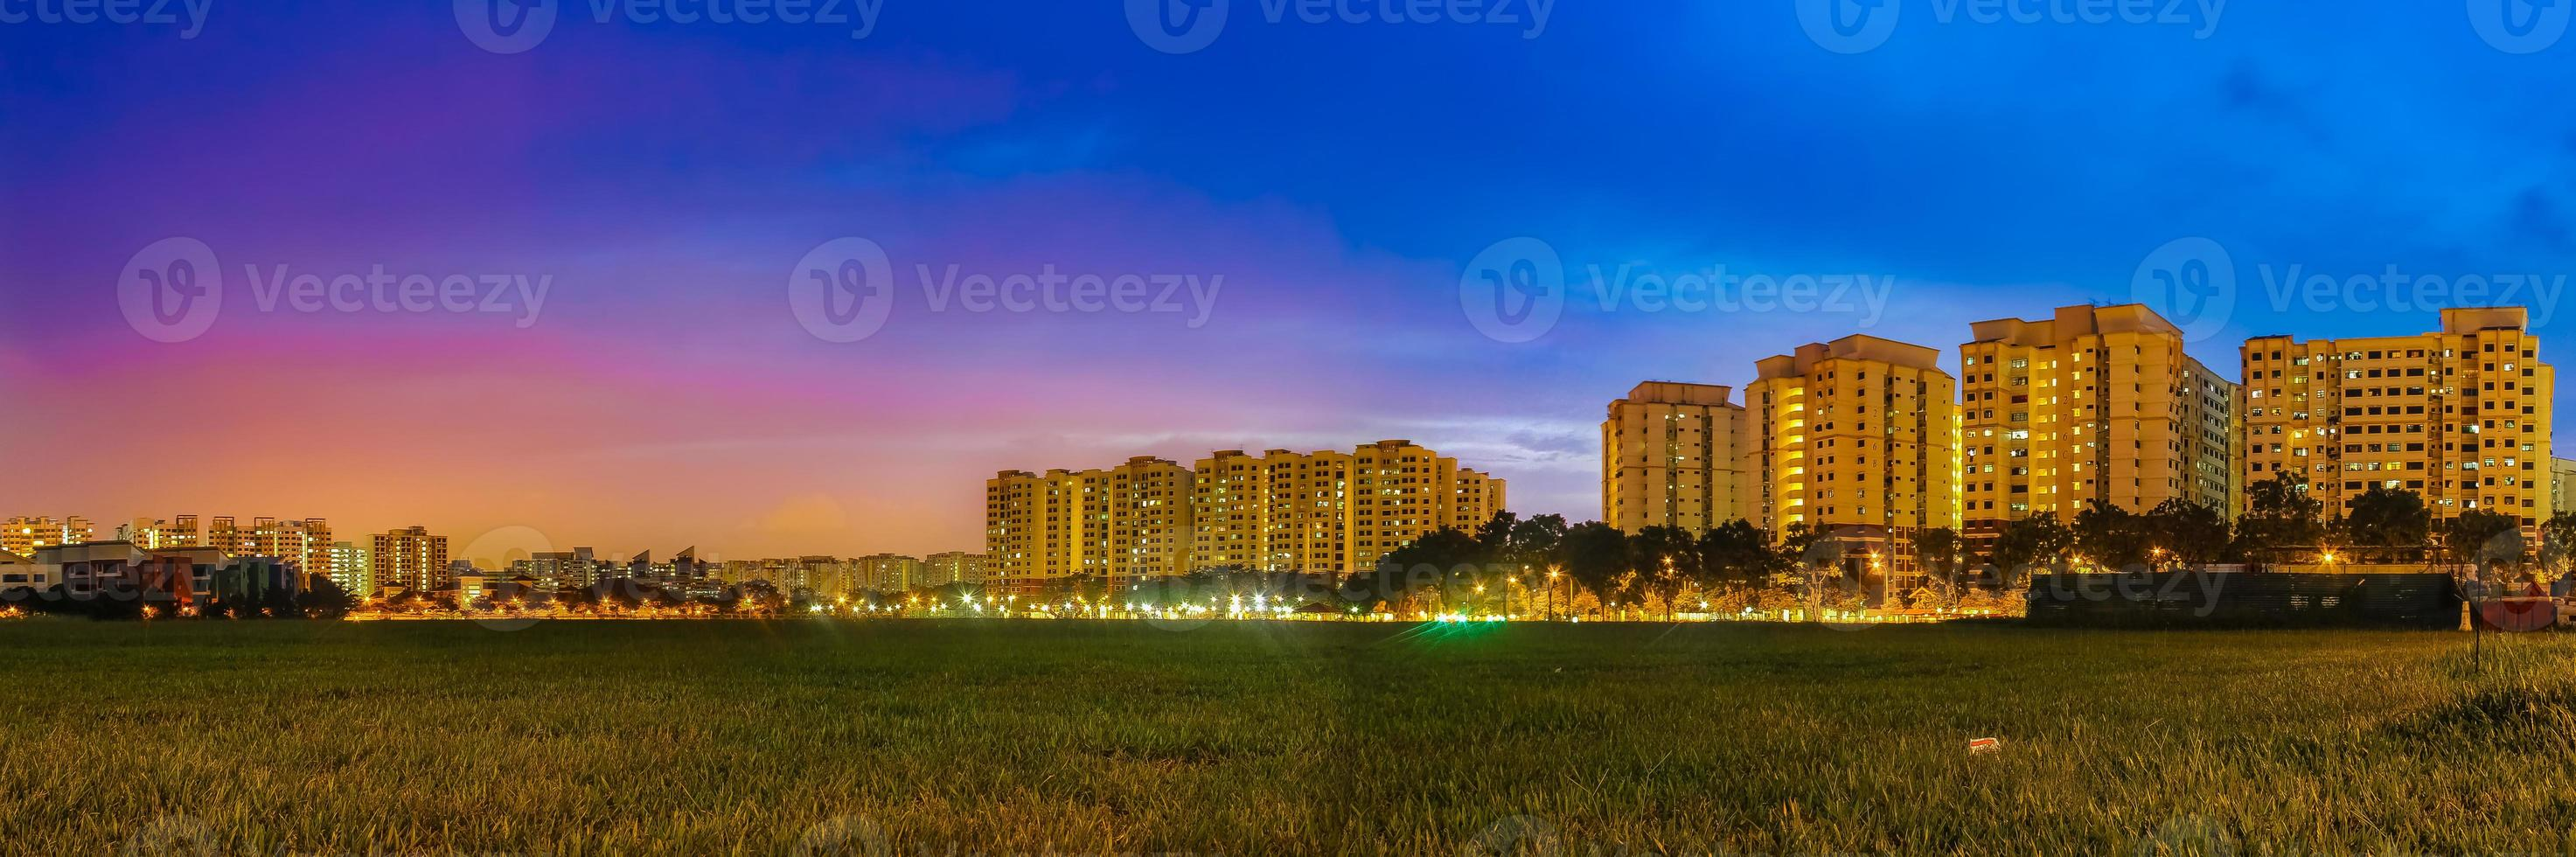 crepuscolo singapore foto